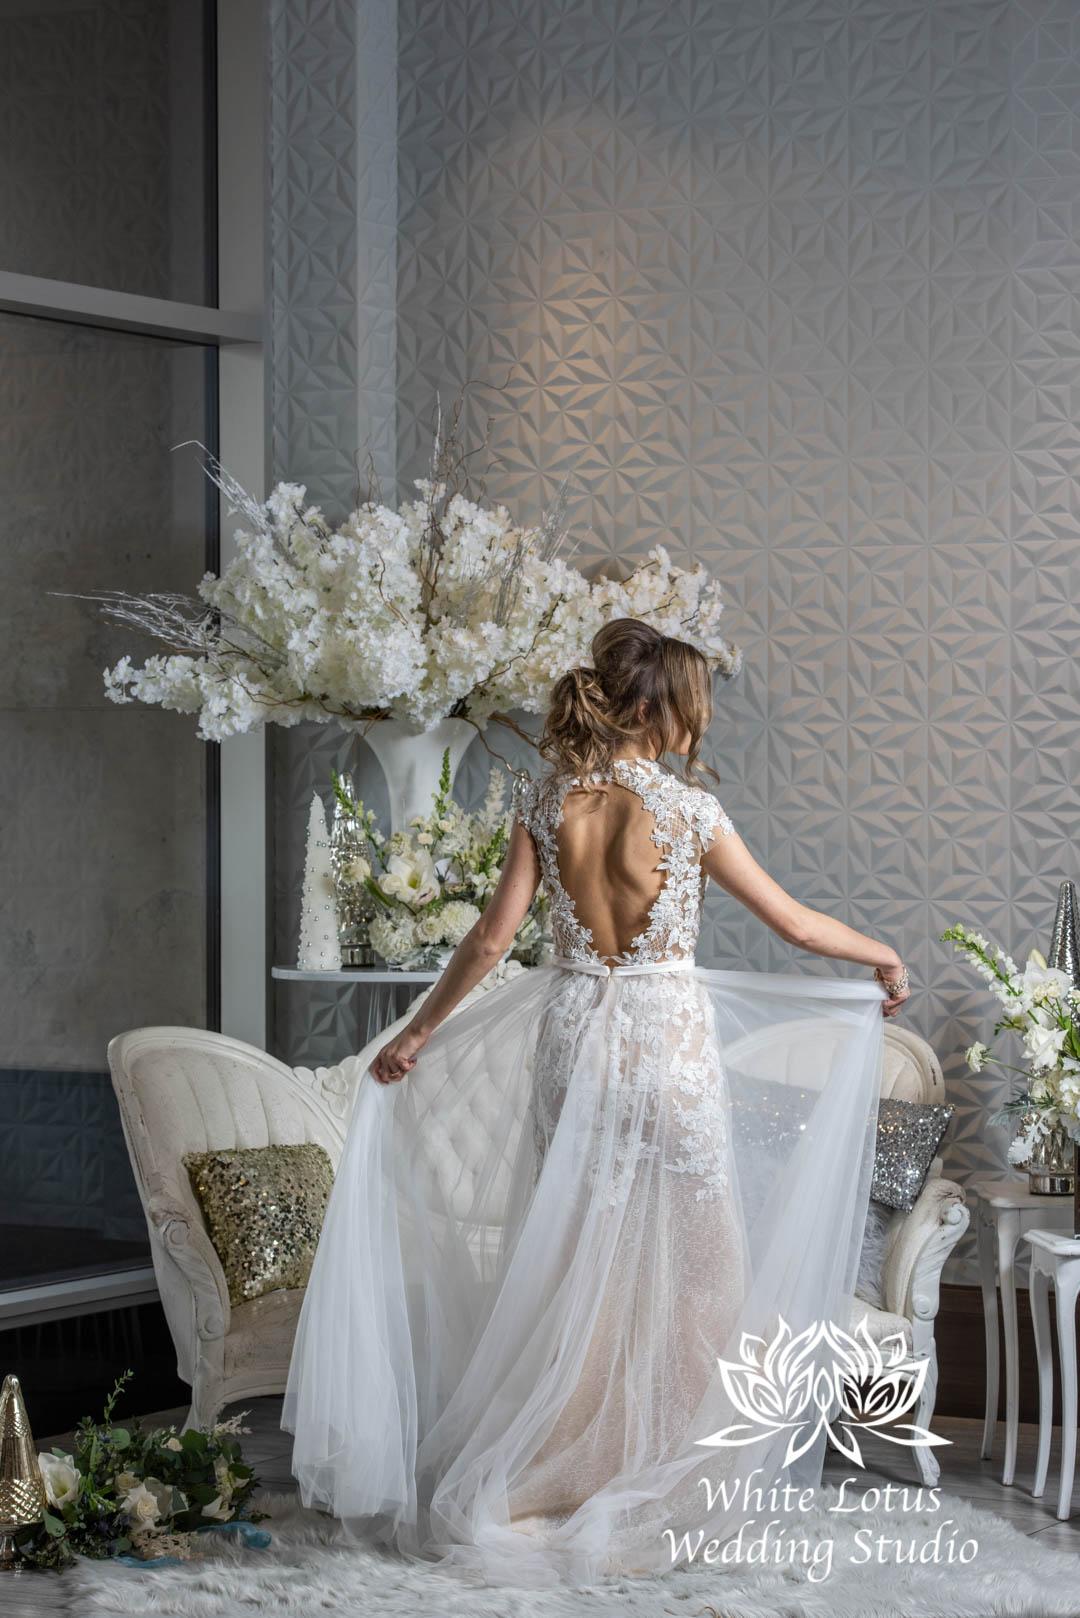 078- GLAM WINTERLUXE WEDDING INSPIRATION